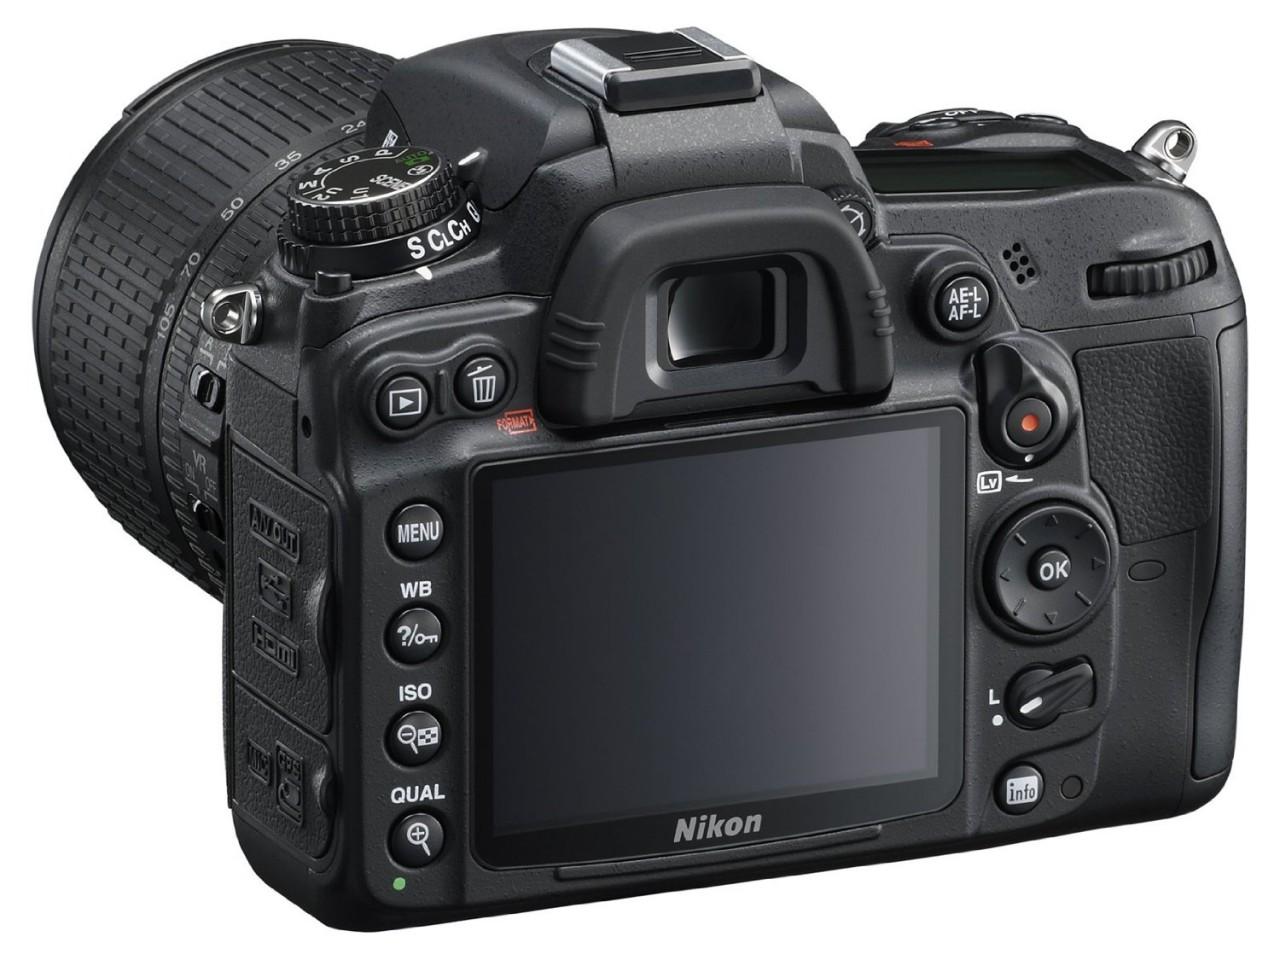 products Nikon D MP DXFormat CMOS Digital SLR with mm f AFS DX VR ED Nikkor Lens in Pakistan